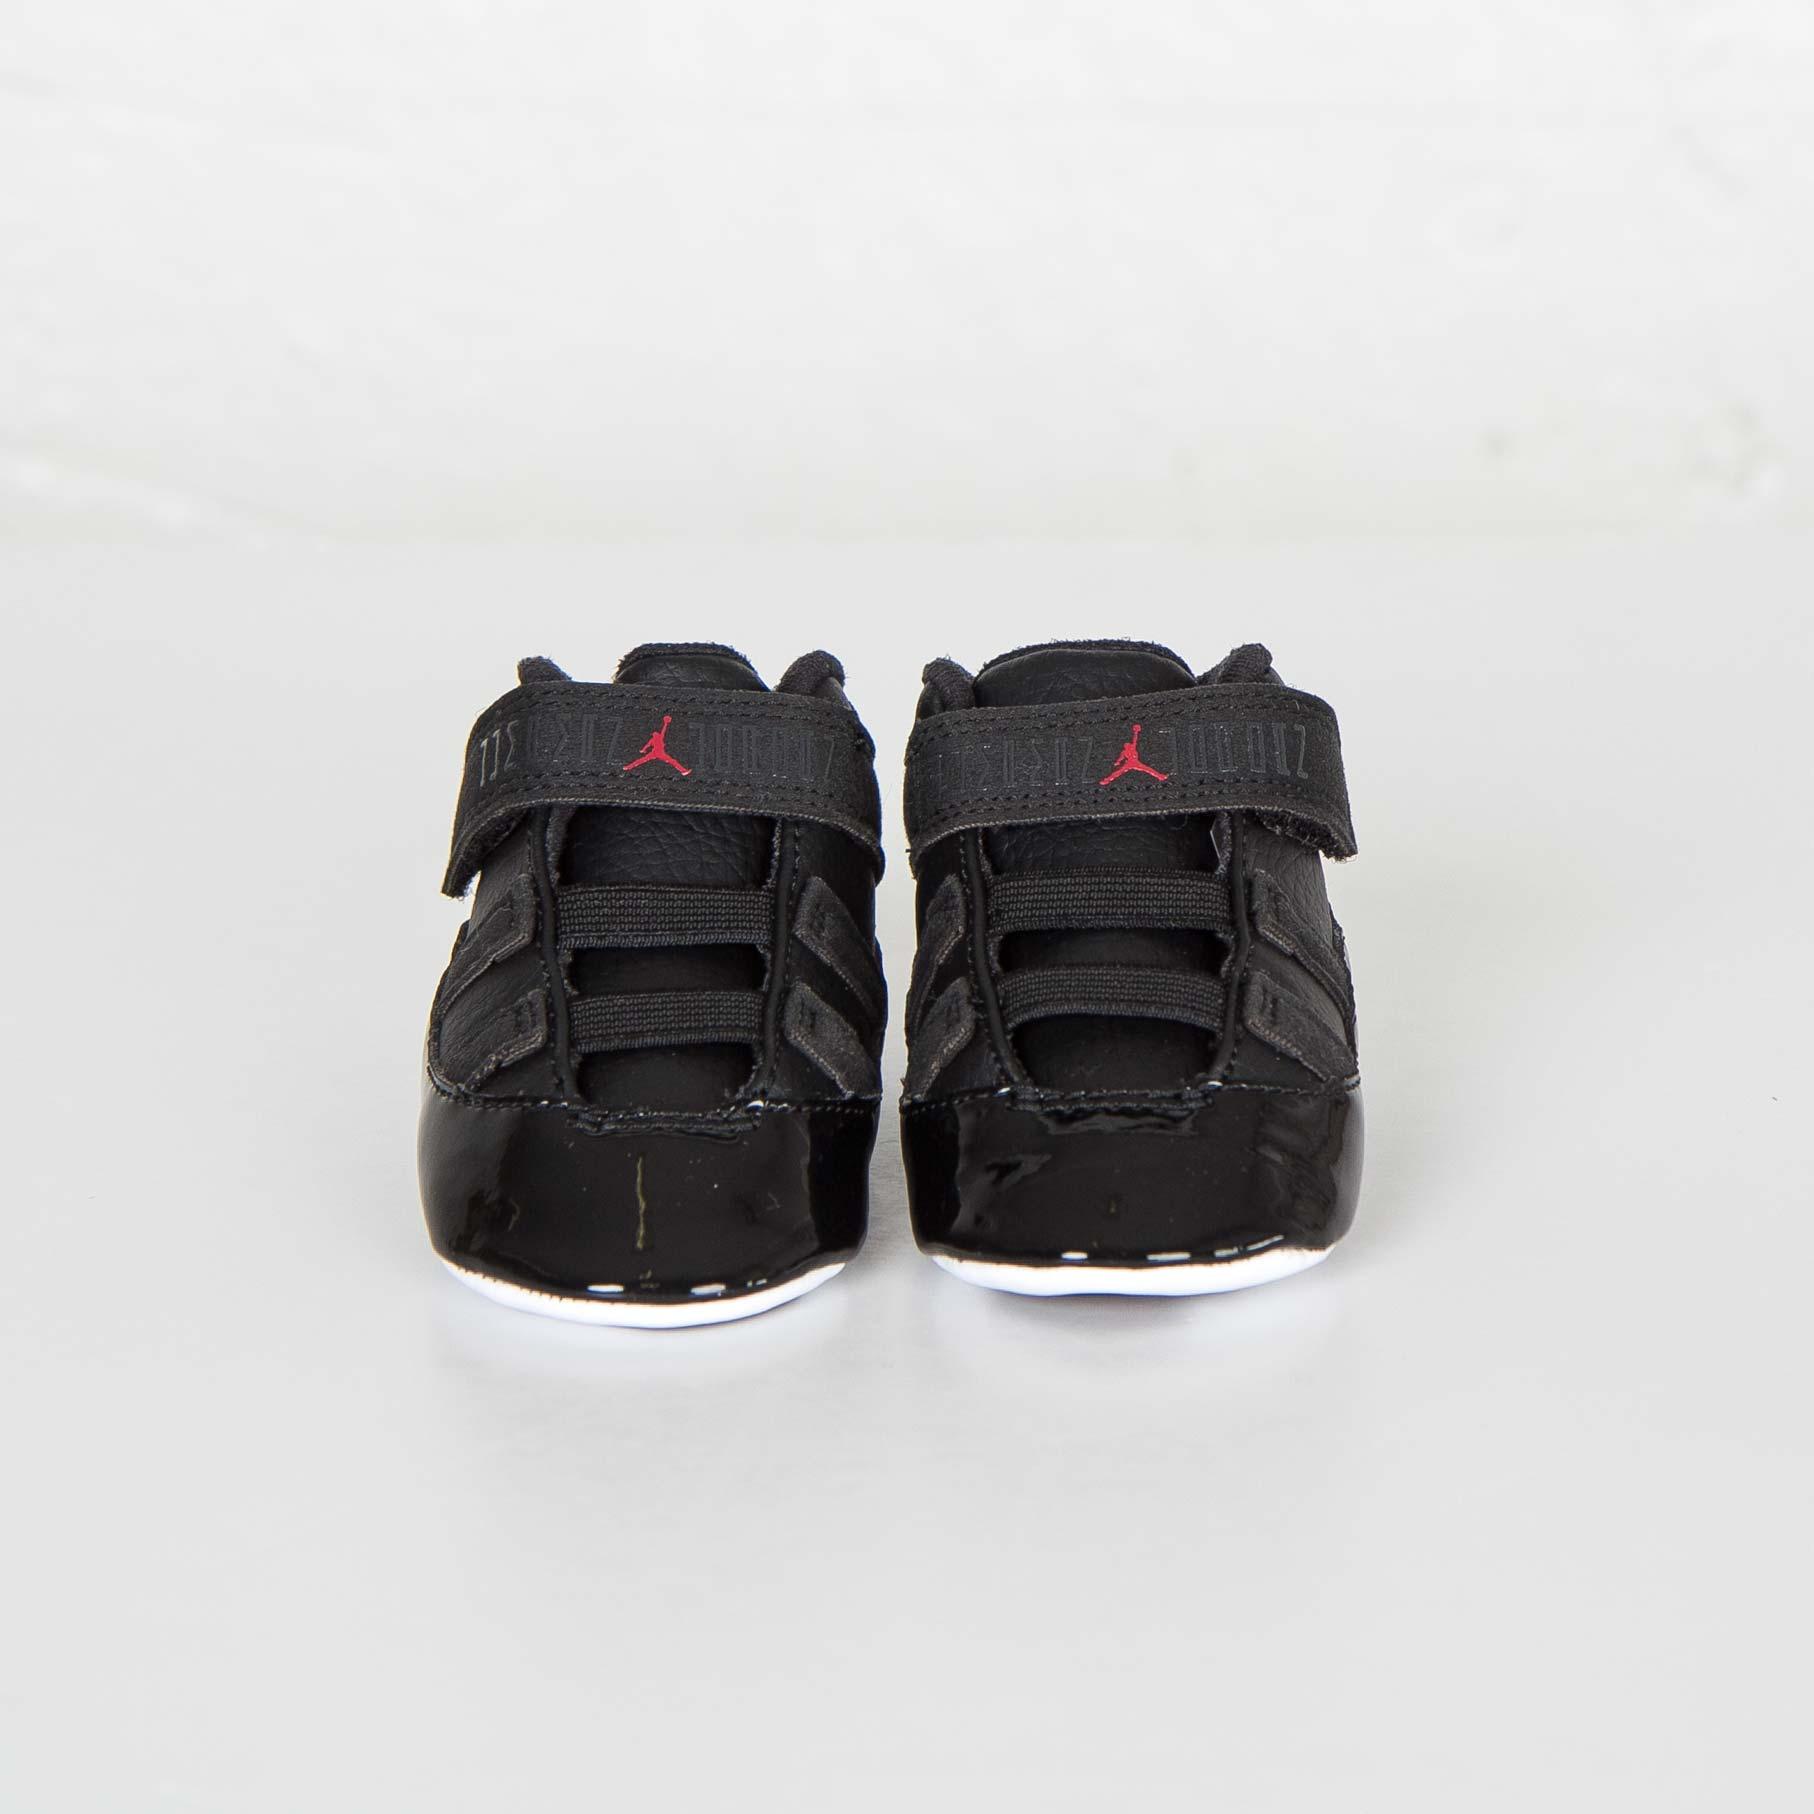 2497a27b6642 Jordan Brand Air Jordan 11 Retro Infant - 378049-002 ...